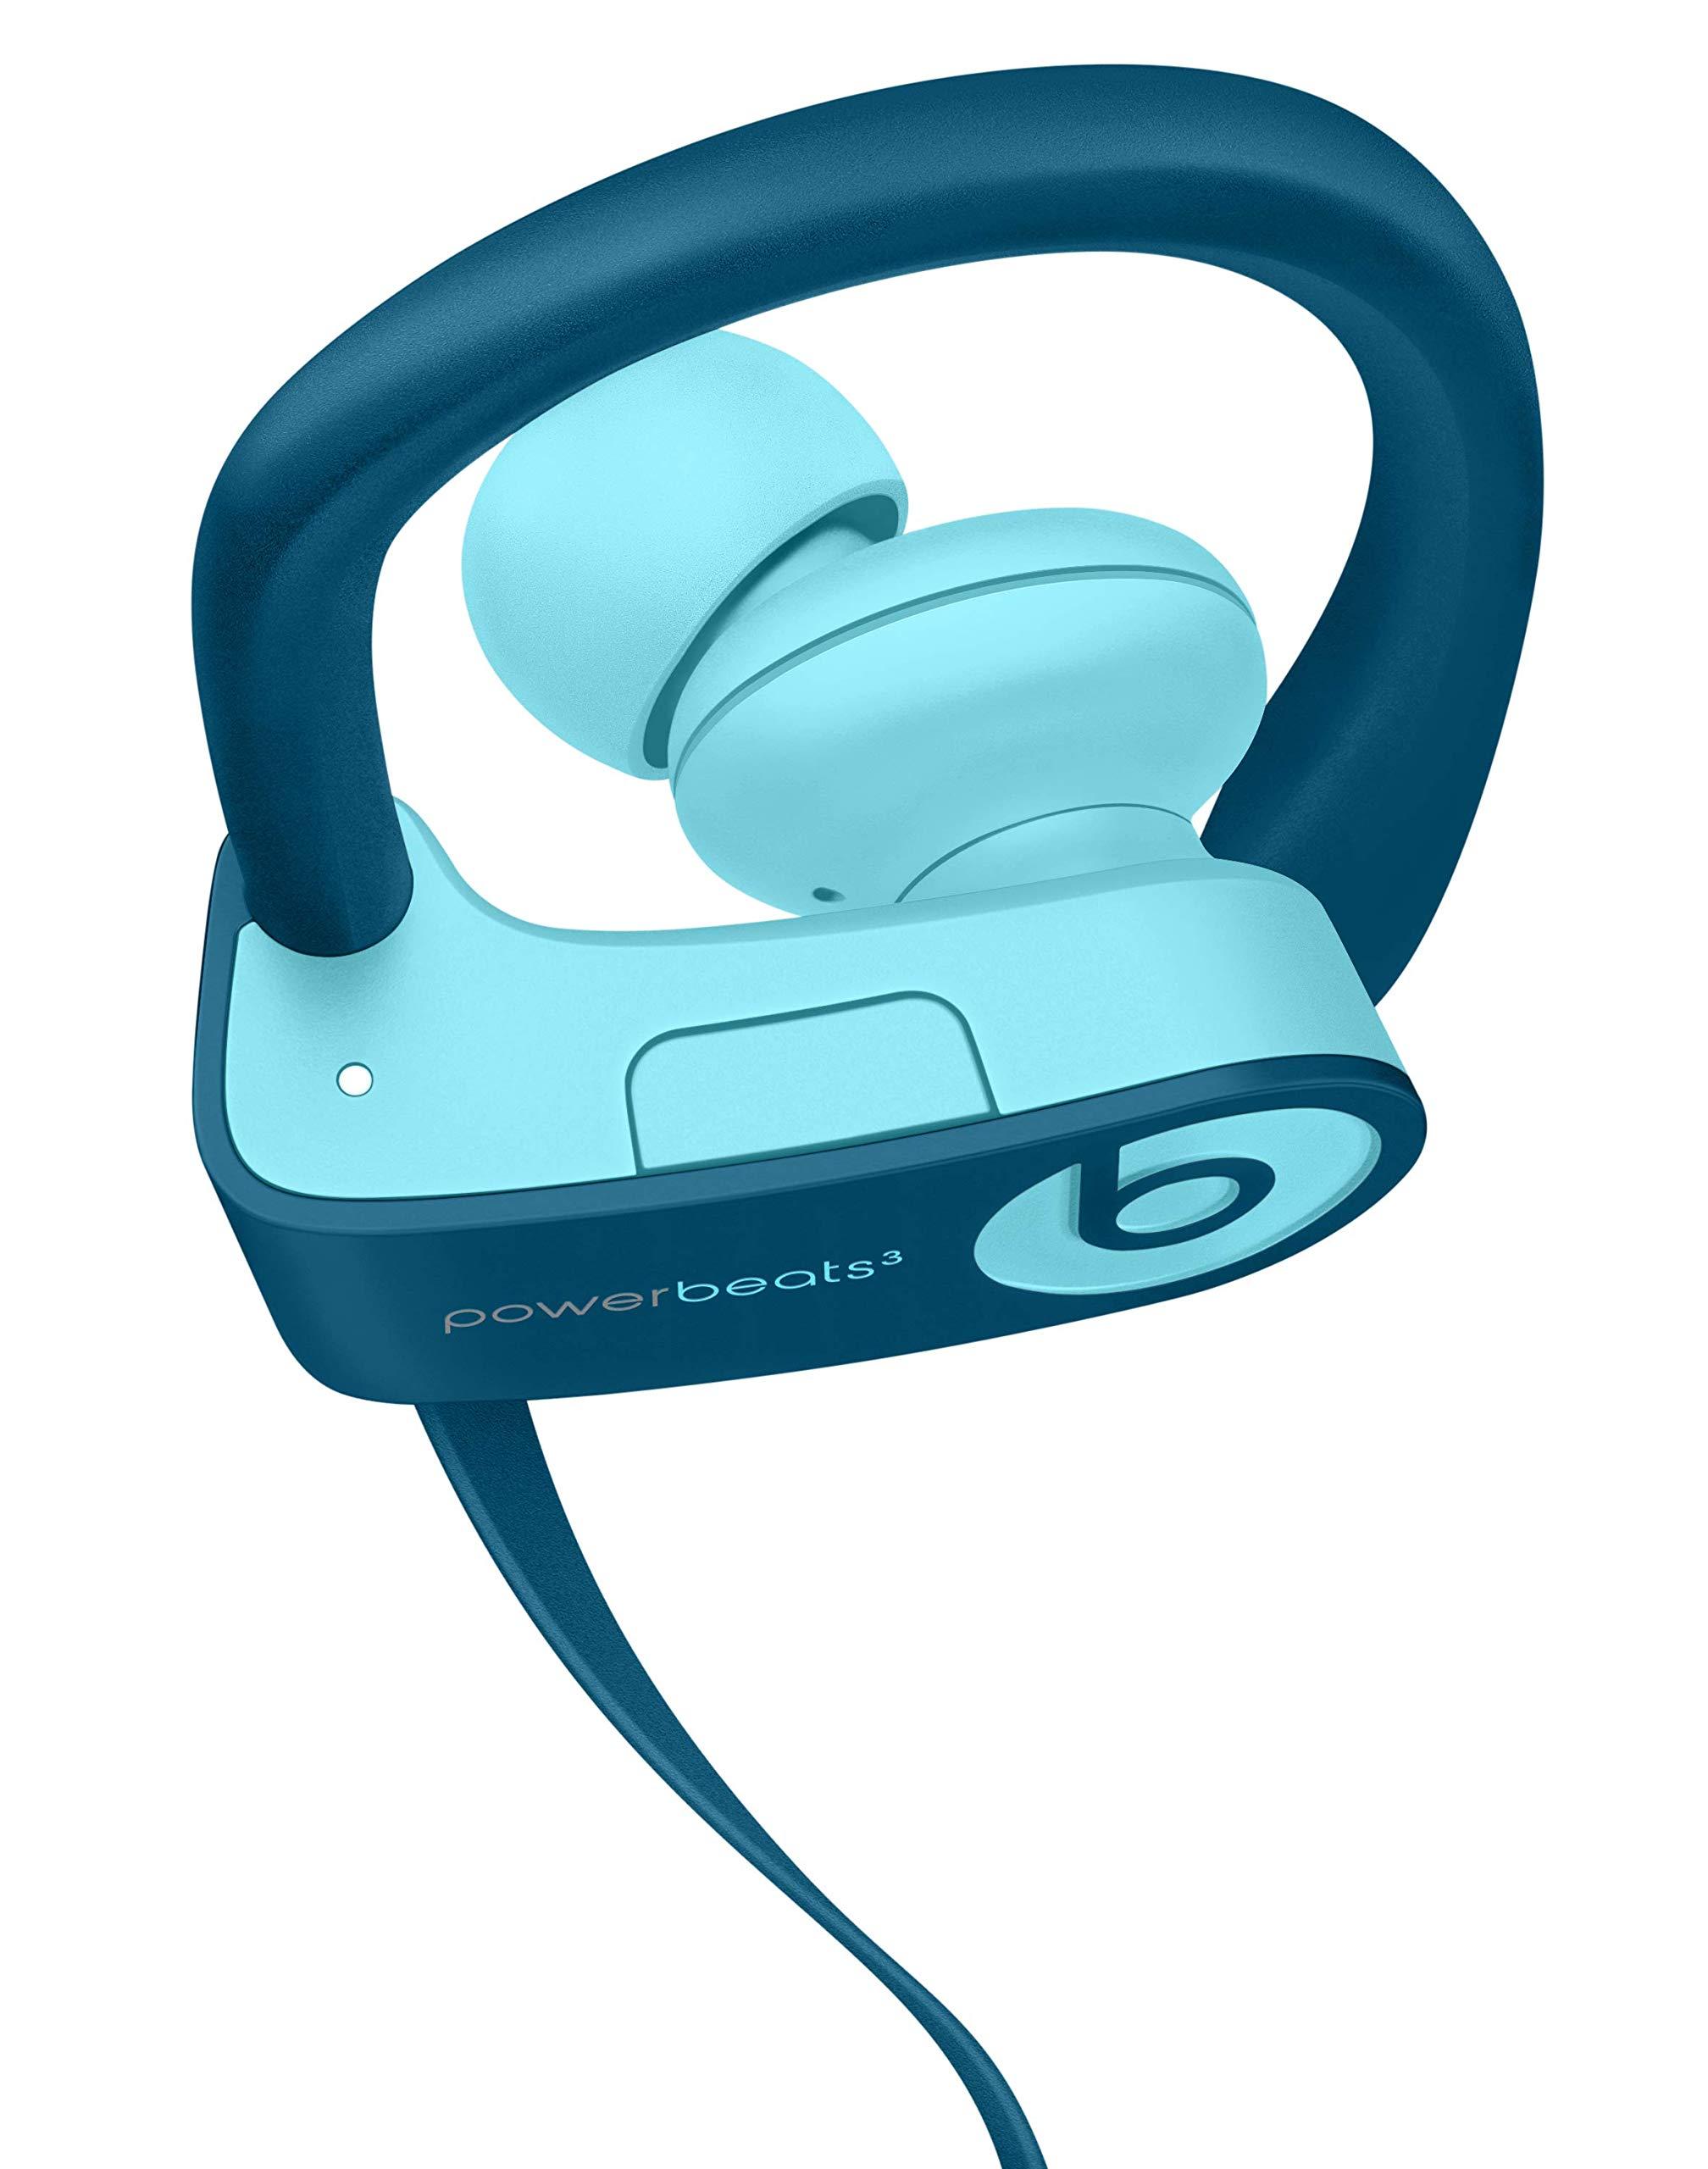 Powerbeats3Wireless Earphones